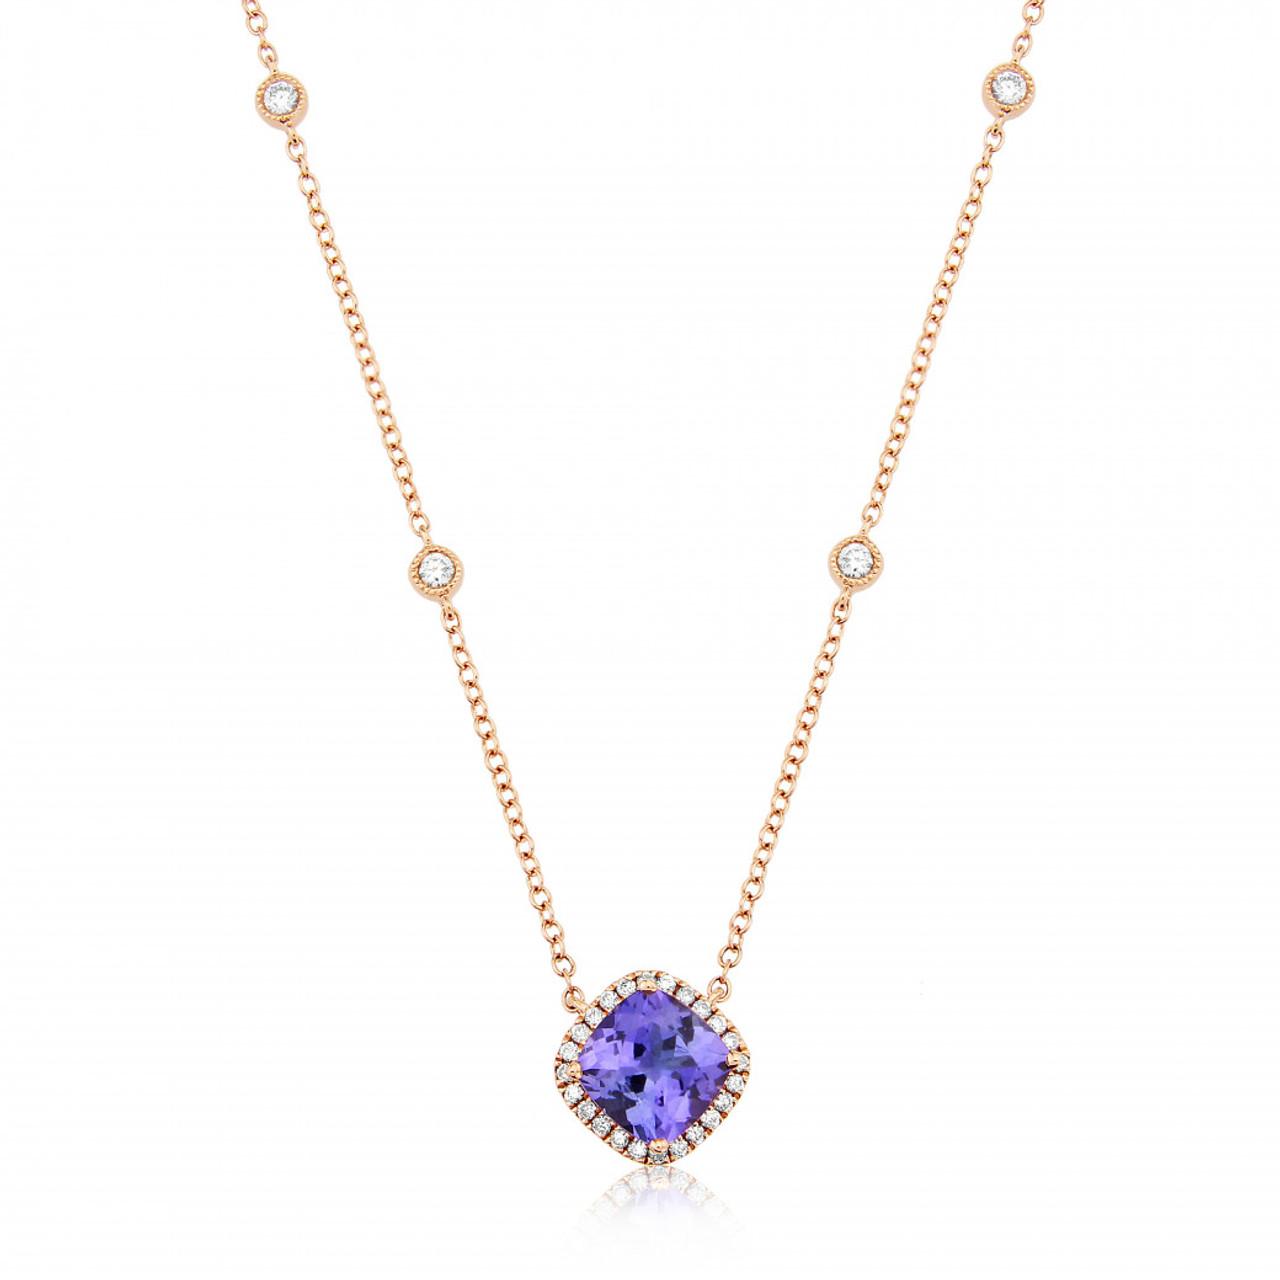 9ct Rose Gold Diamond & Tanzanite Pendant Necklace